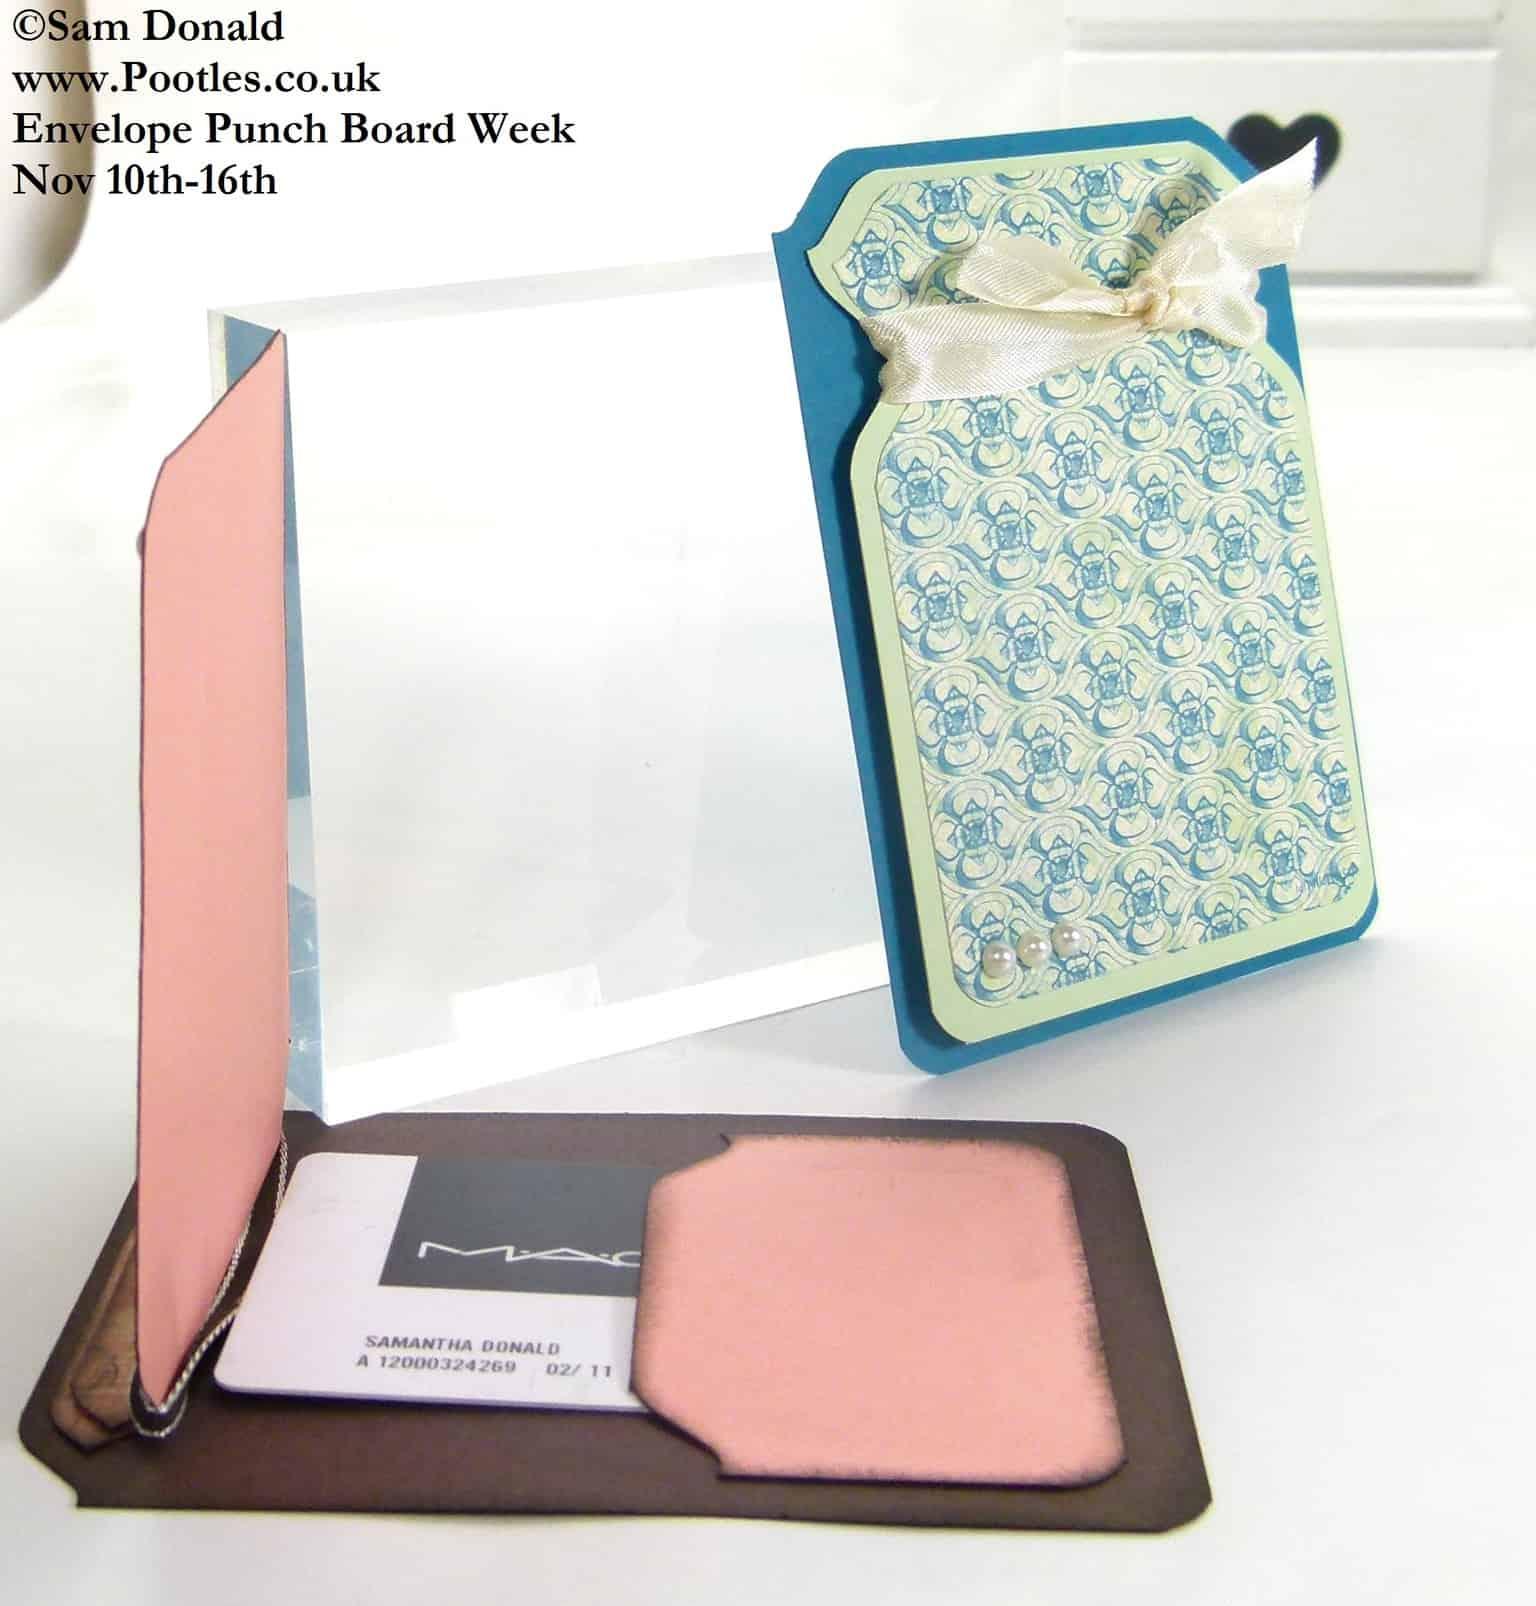 POOTLES Stampin Up ENVELOPE PUNCH BOARD WEEK The Unusual Gift Card Holder